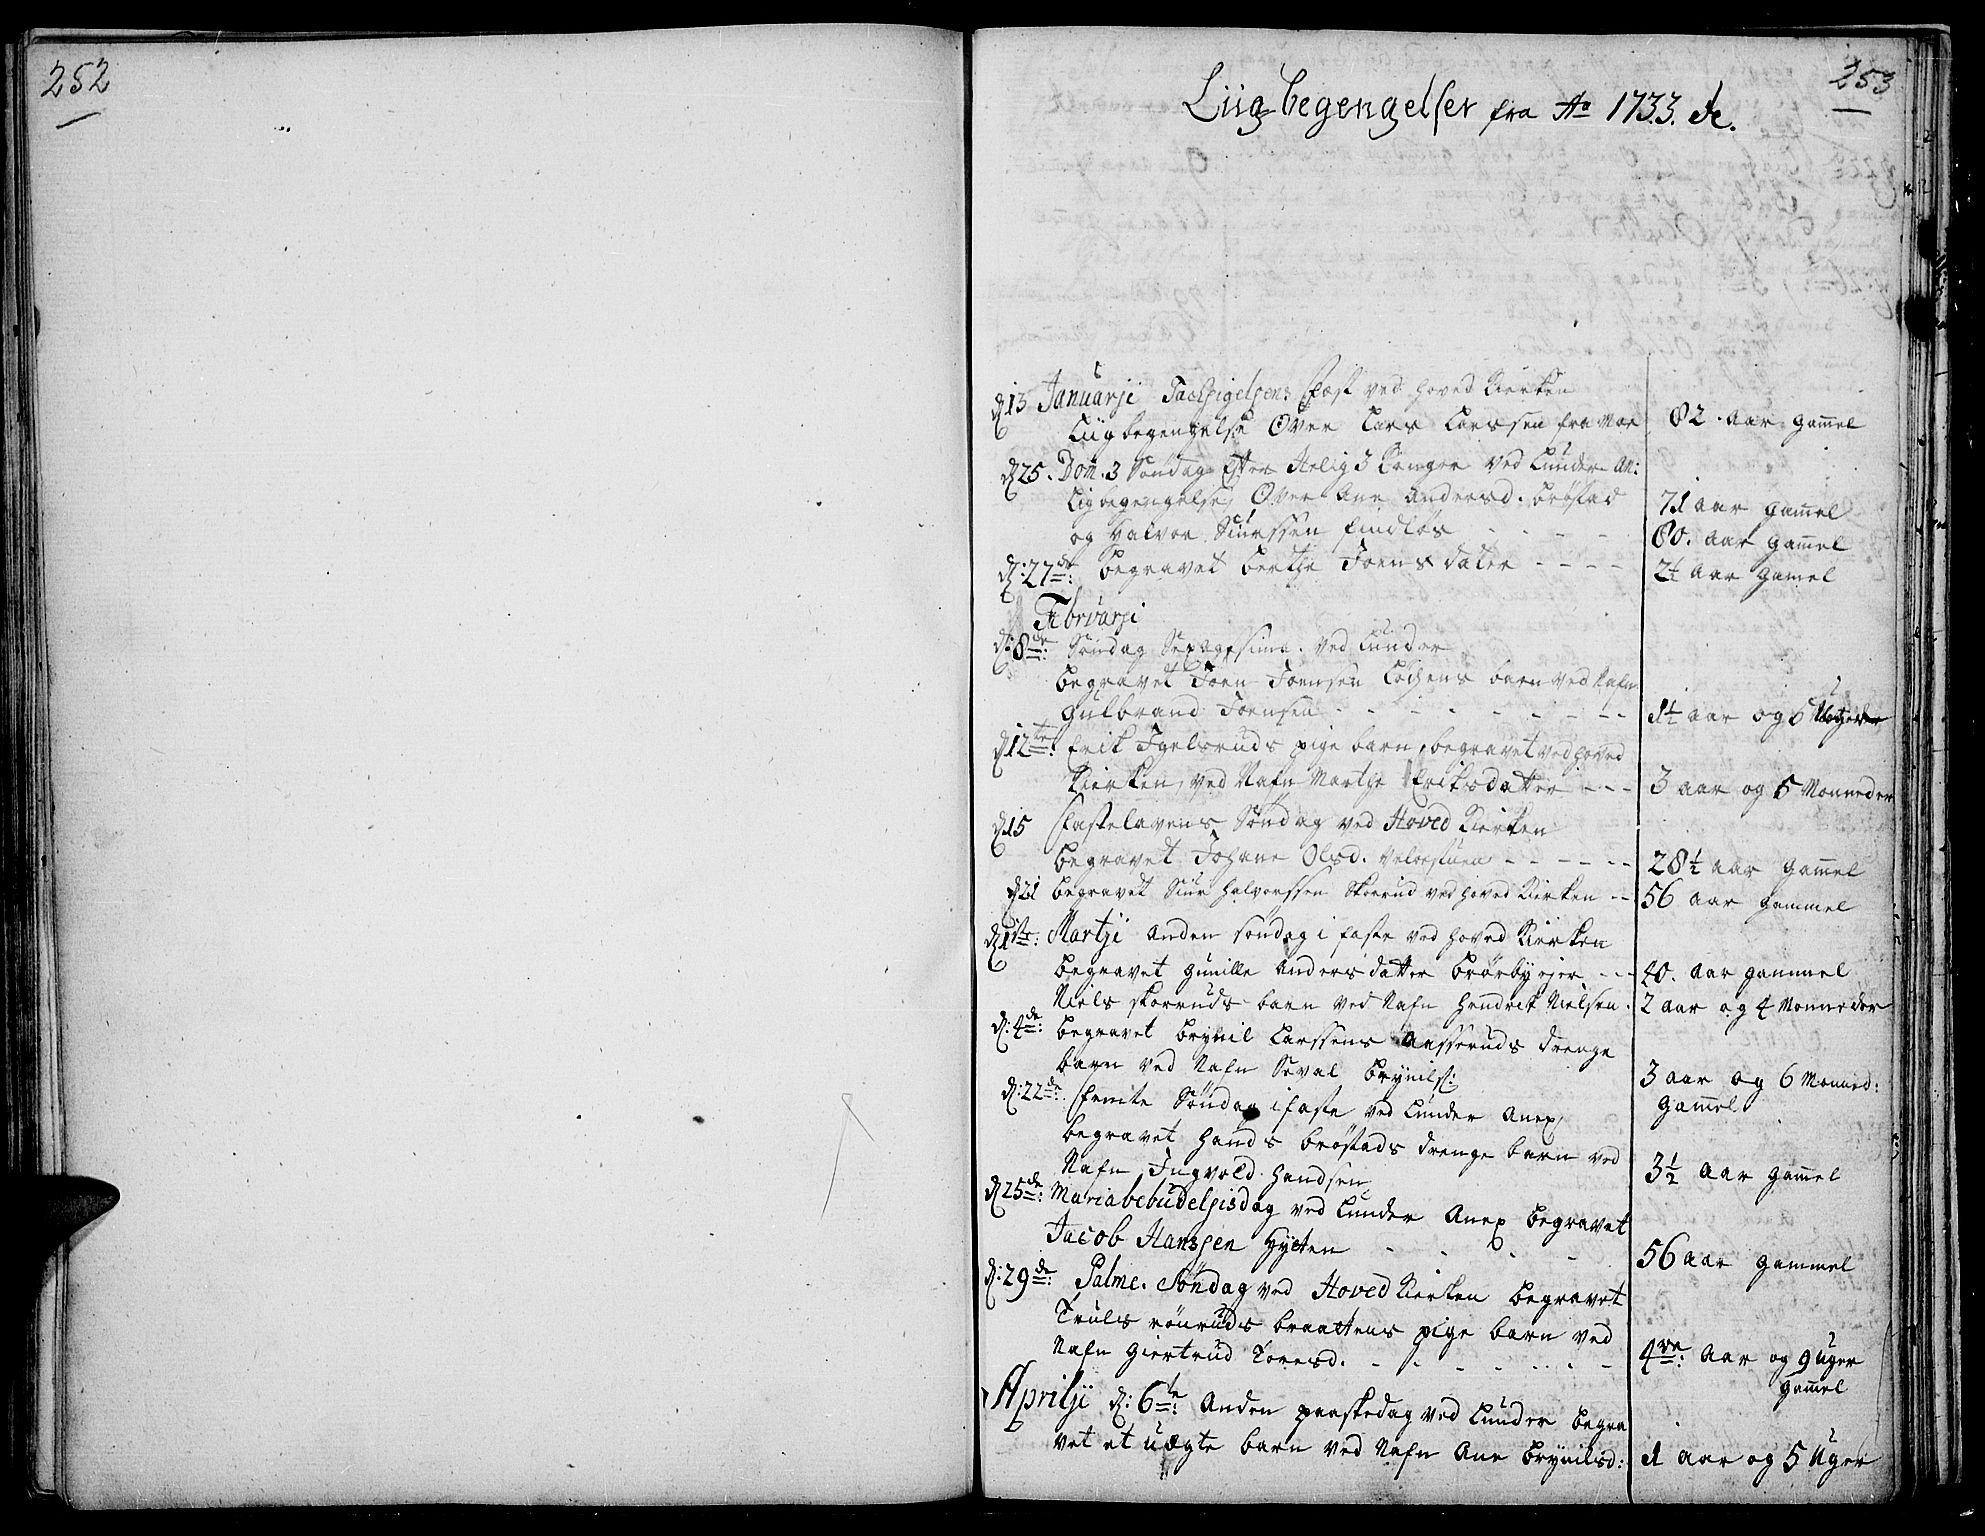 SAH, Jevnaker prestekontor, Ministerialbok nr. 2, 1725-1751, s. 252-253